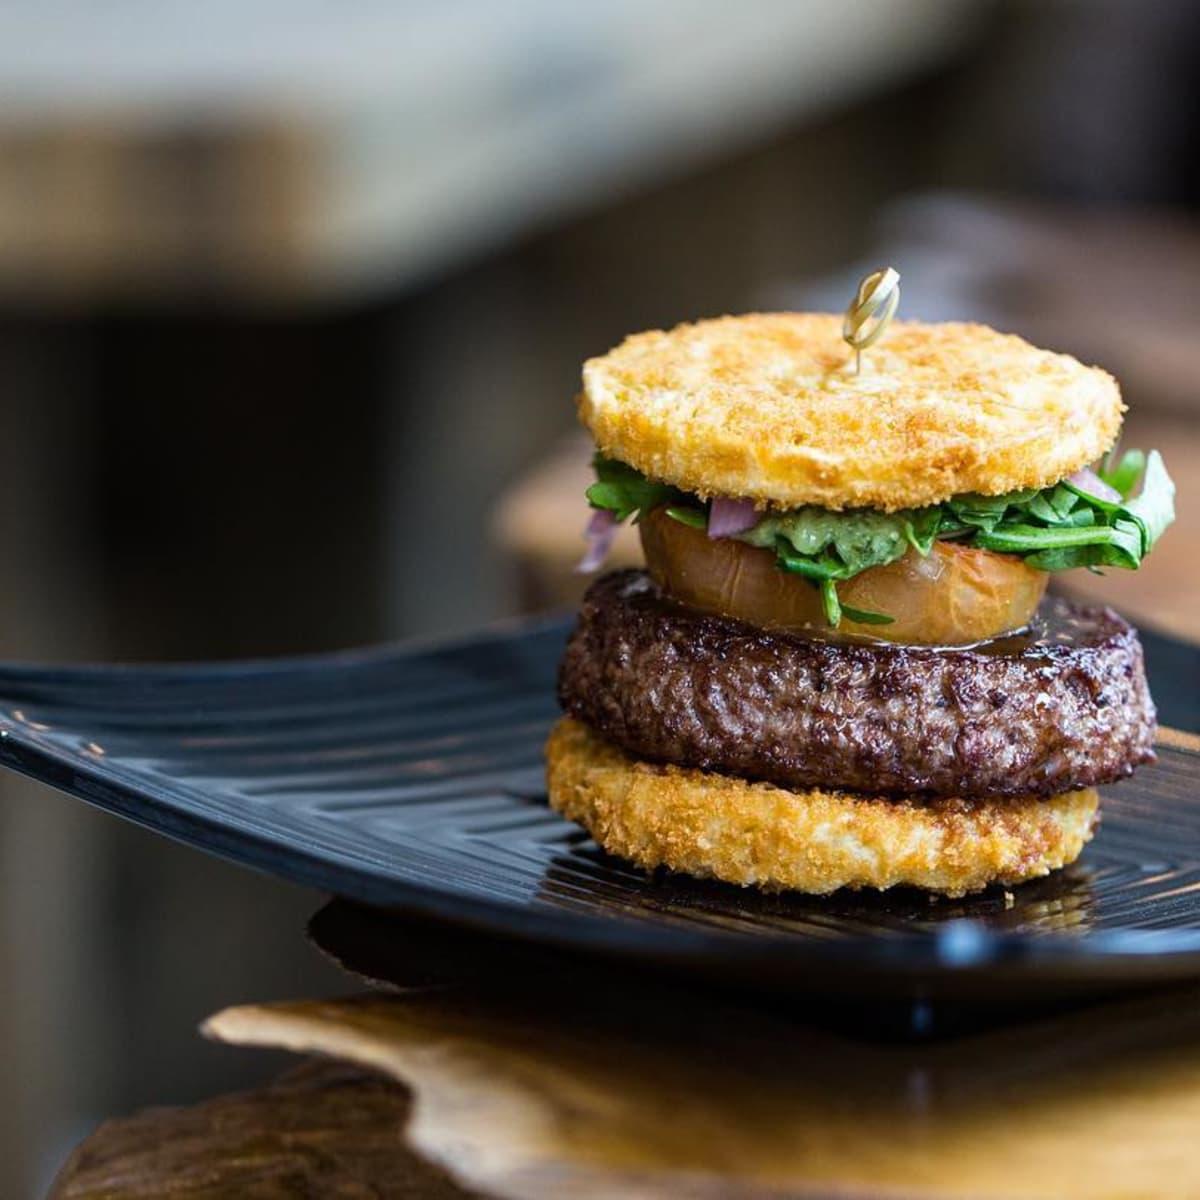 Yoshi Ramen ATX burger